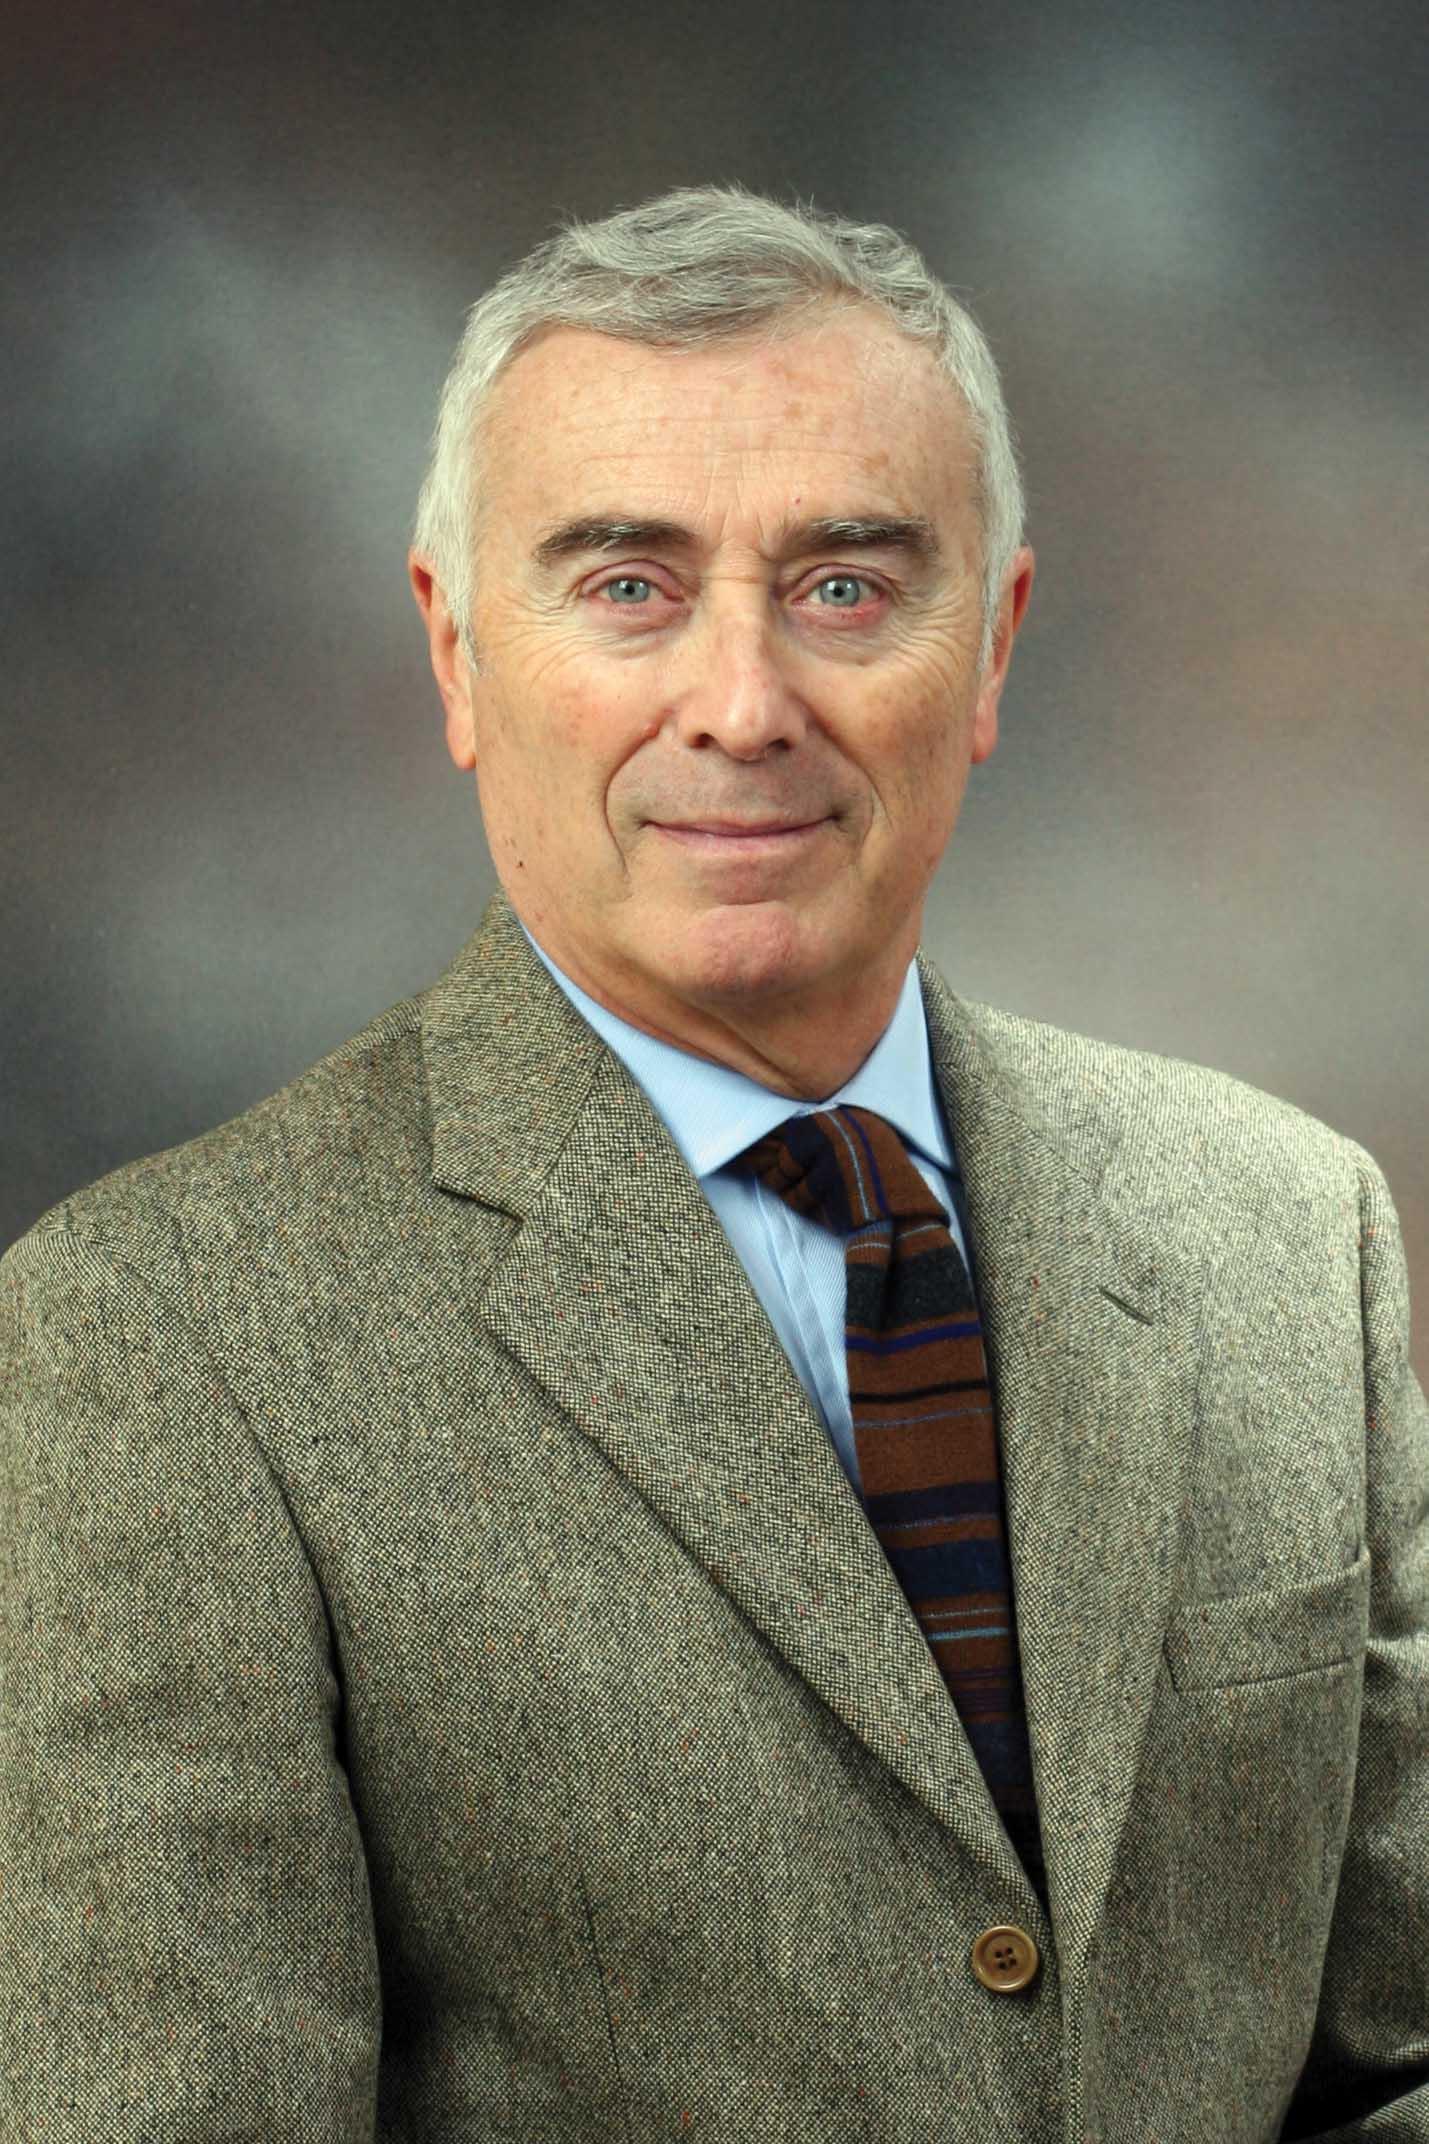 consorzio prosicutto san daniele presidente 2015 18 Giuseppe Villani